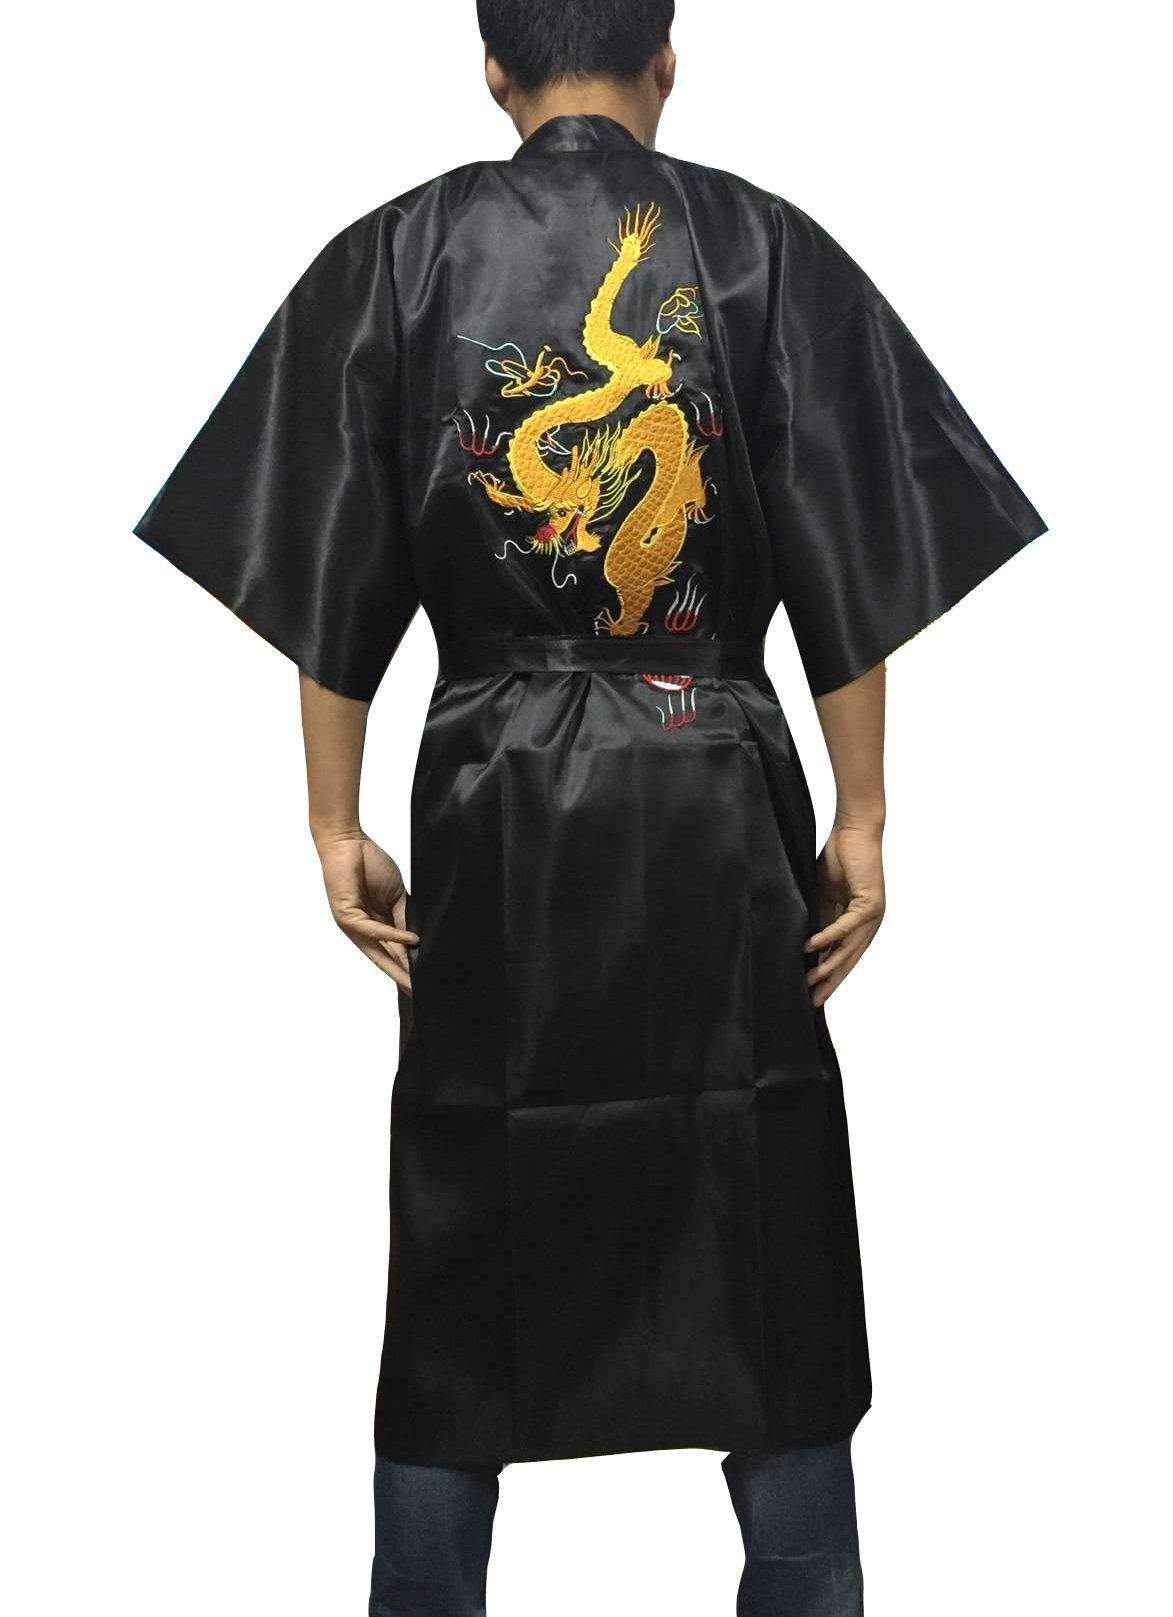 YueLian Men's Long Satin Chinese Dragon Embroidery Robe Kimono Bathrobe Sleepwear Black